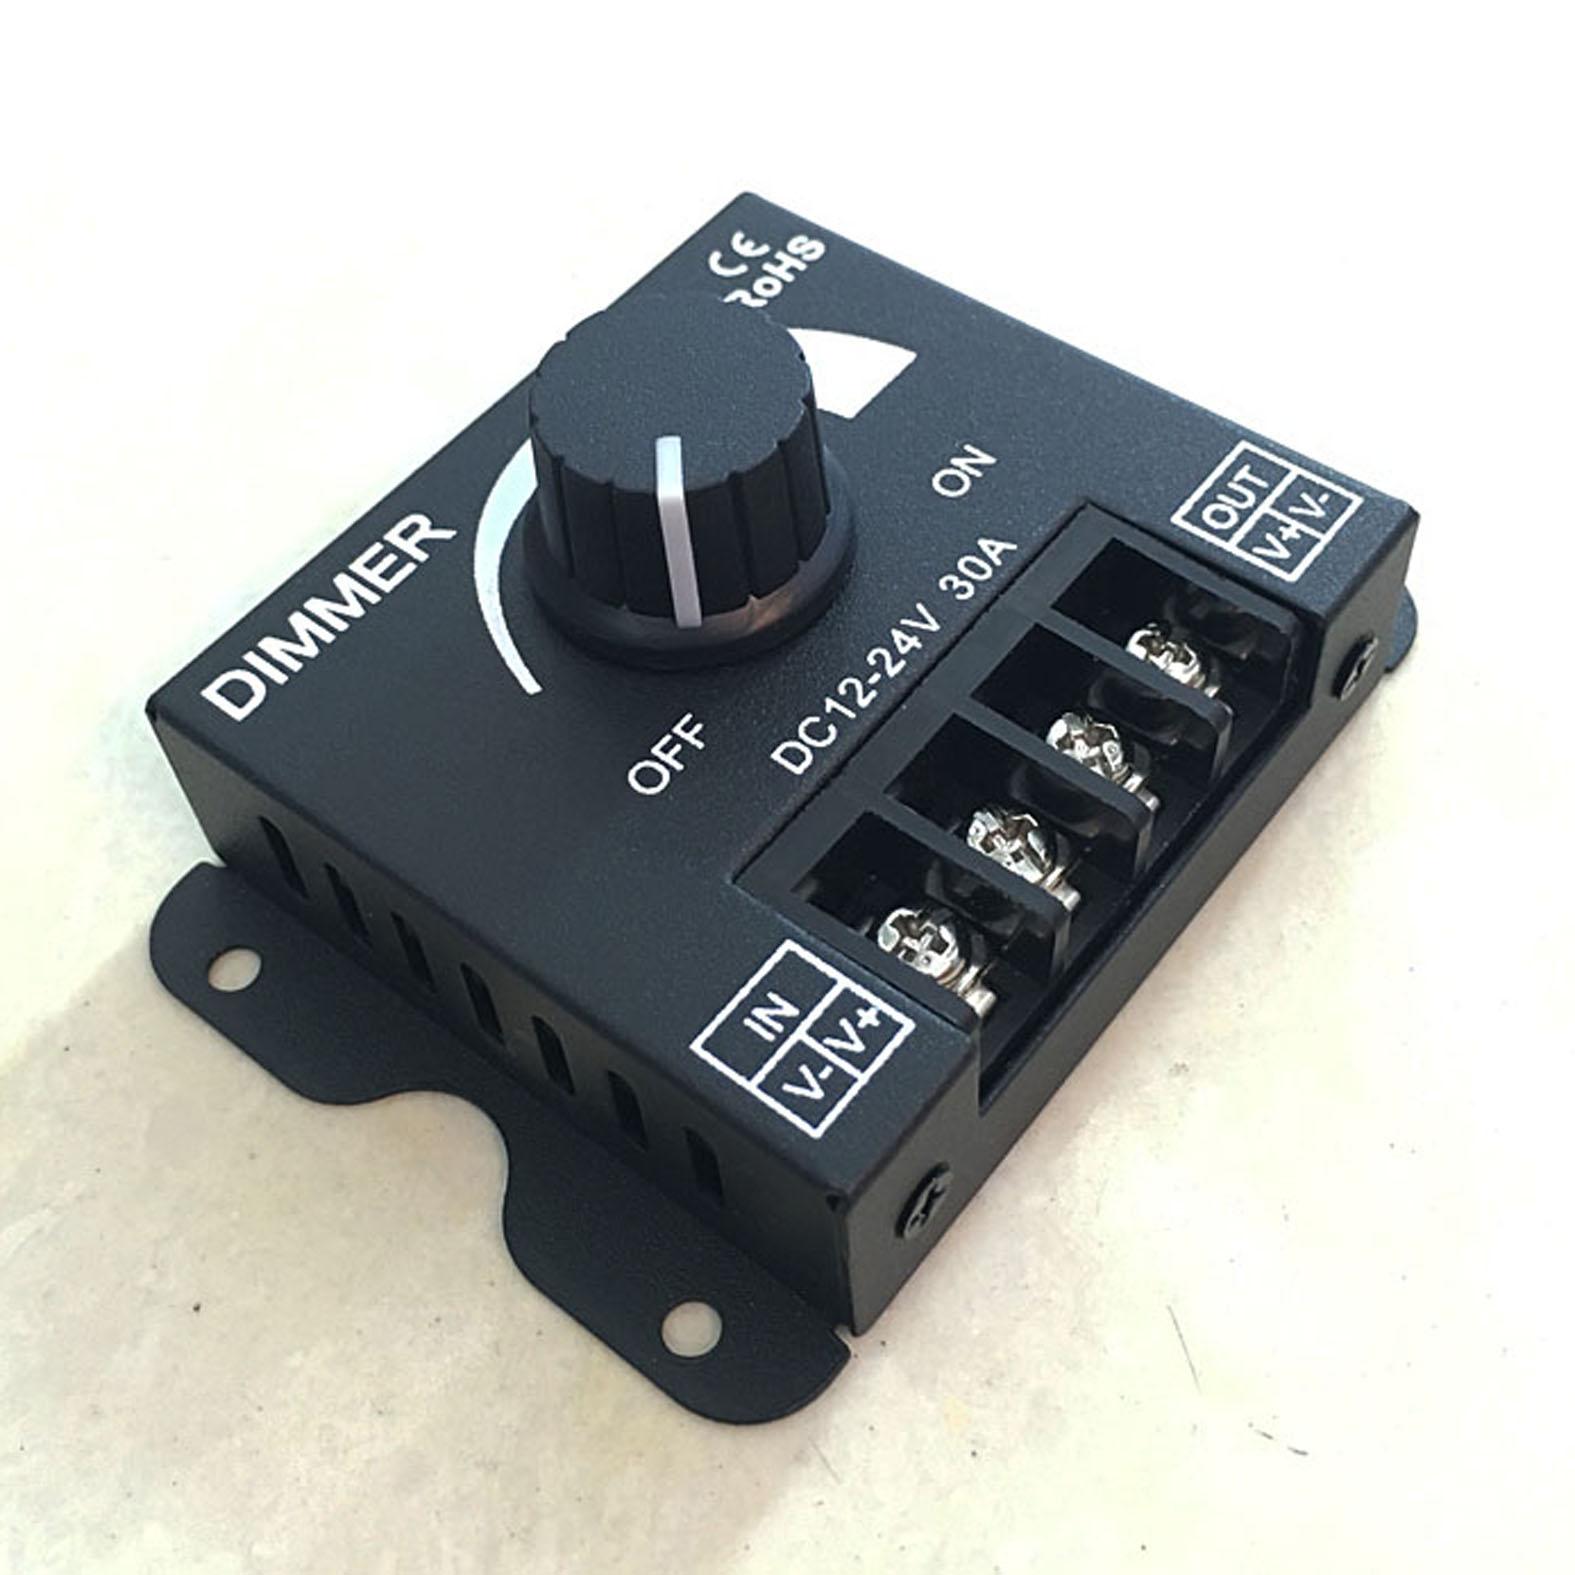 DC12V-24V LED atenuador 30A 360W brillo ajustable atenuación LED tira de luces controlador de un solo Color